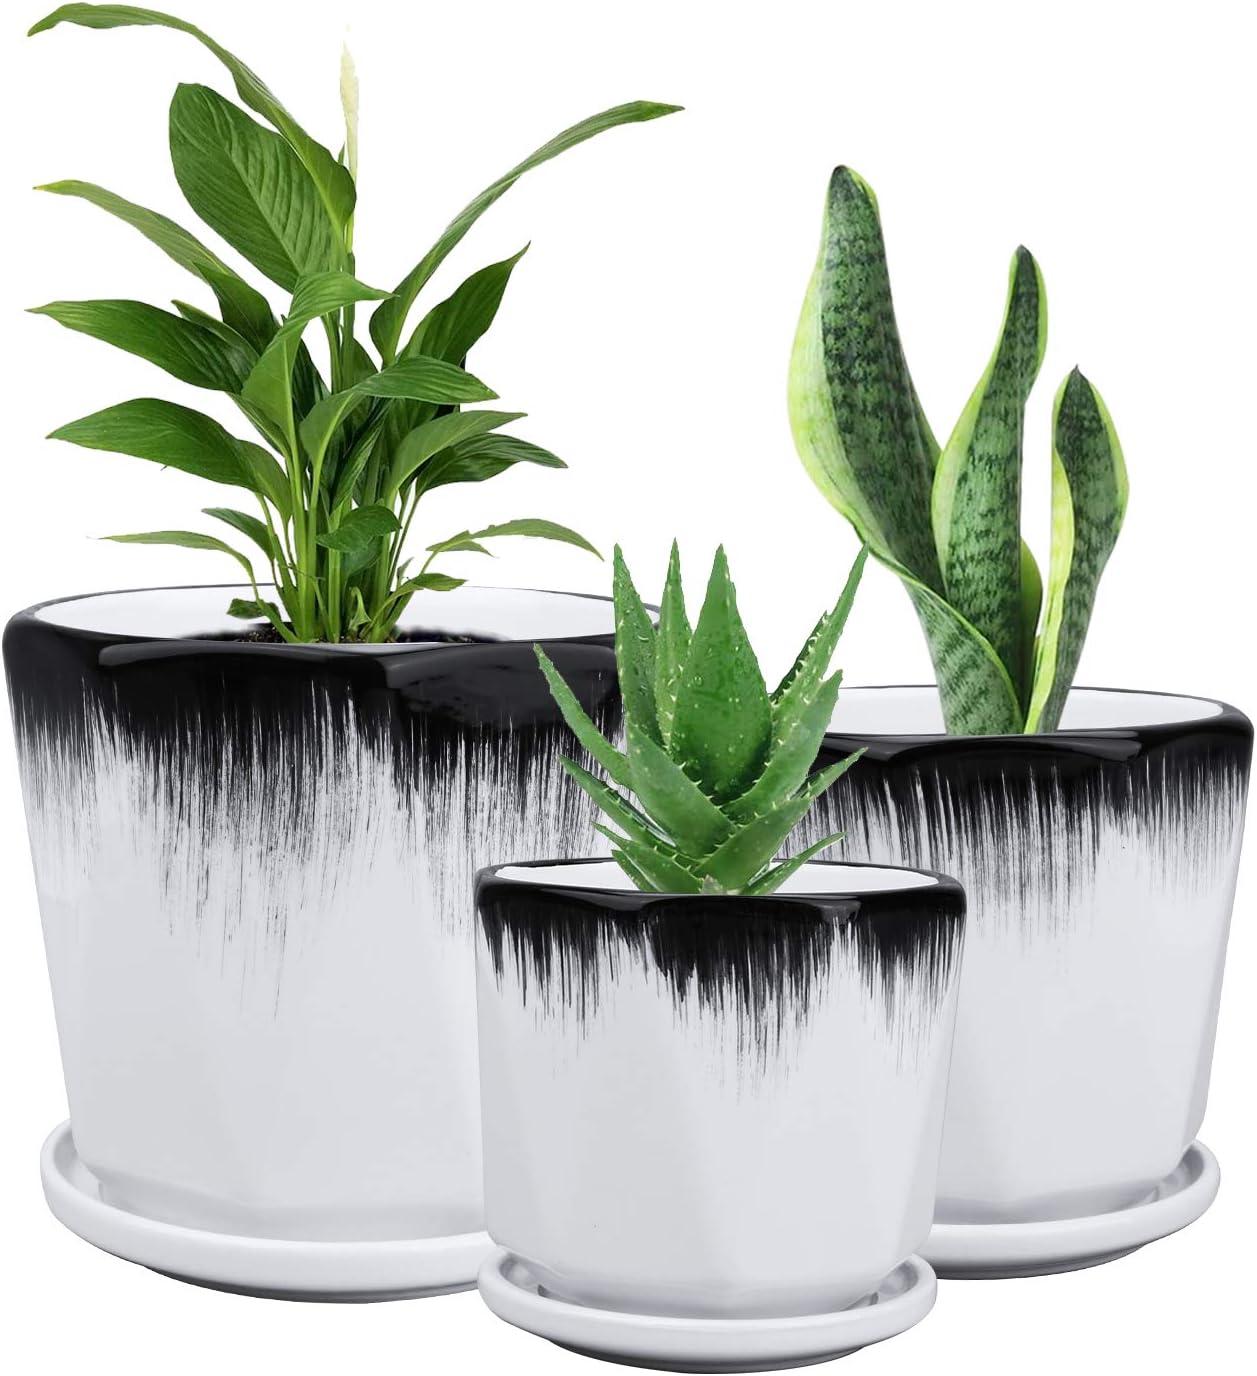 Ufrount Succulent Planter Pots with Drainage Holes, Ceramic Planter Pot Planting Pot Flower Pots for Mini Plant Perfect for Garden, Kitchen, Windowsill - Set of 3 (White)